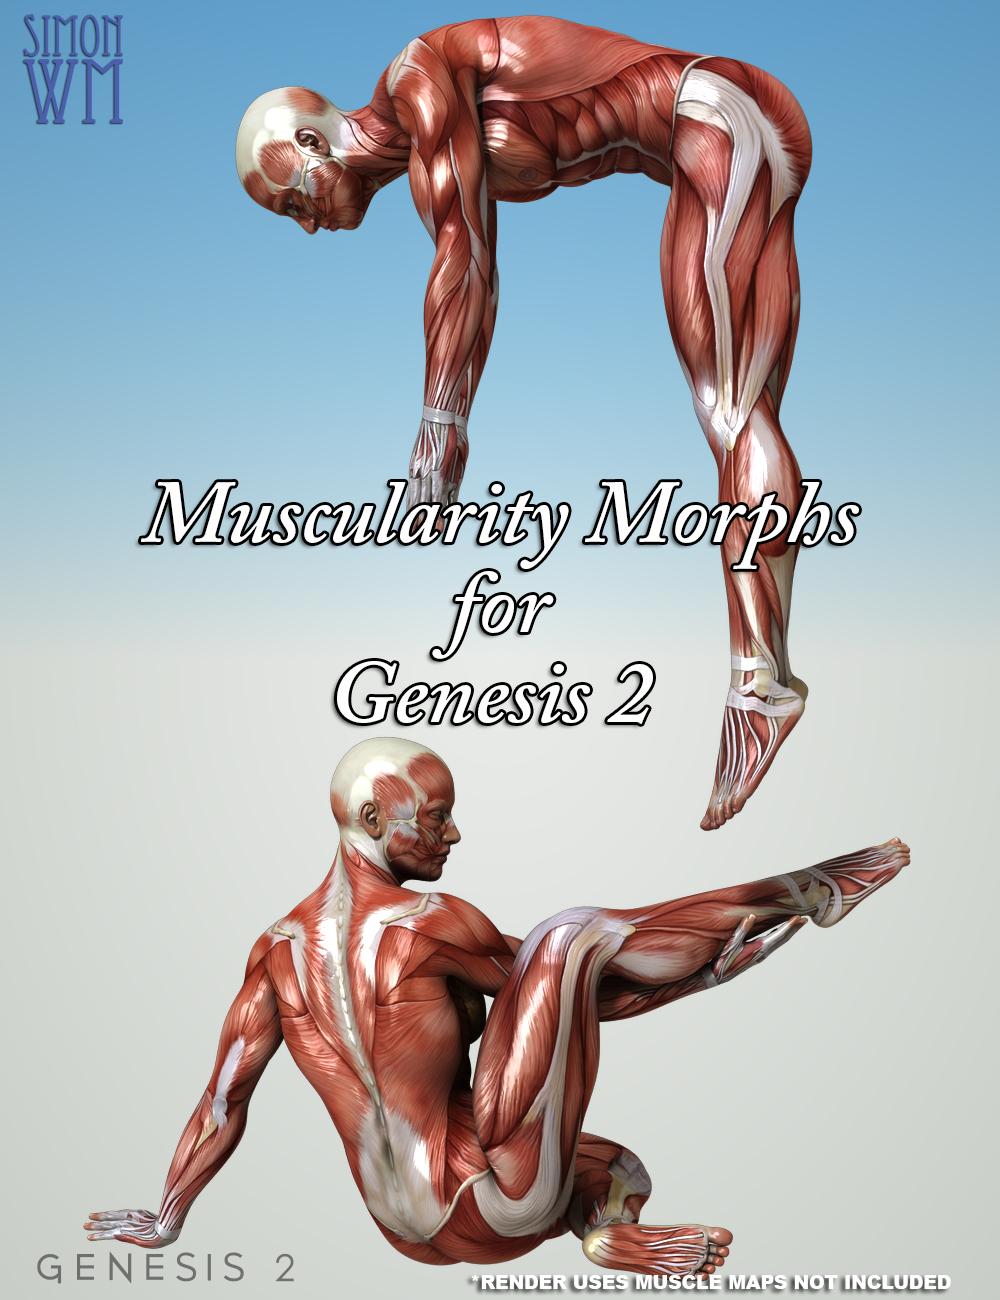 Muscularity Morphs for Genesis 2 Bundle by: SimonWM, 3D Models by Daz 3D